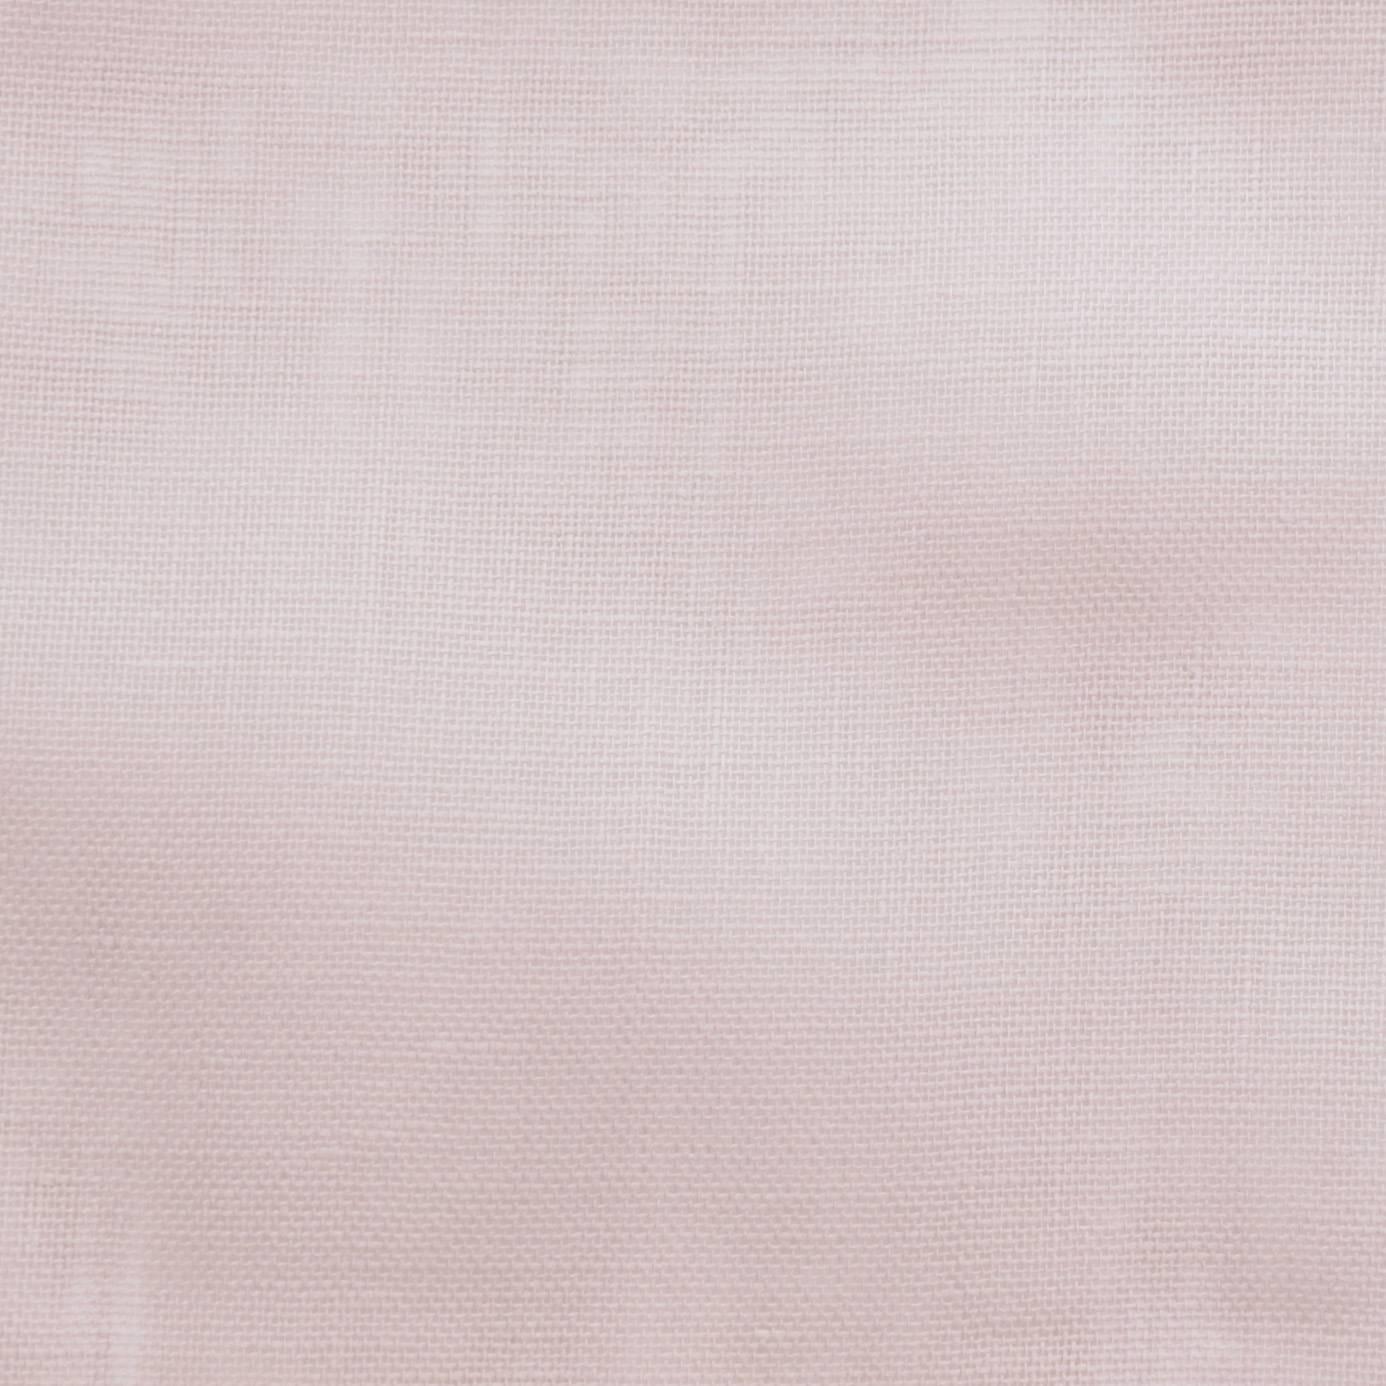 Lightweight Sheers Fabric Petal 243346 Sanderson Lightweight Sheers Fabric Collection